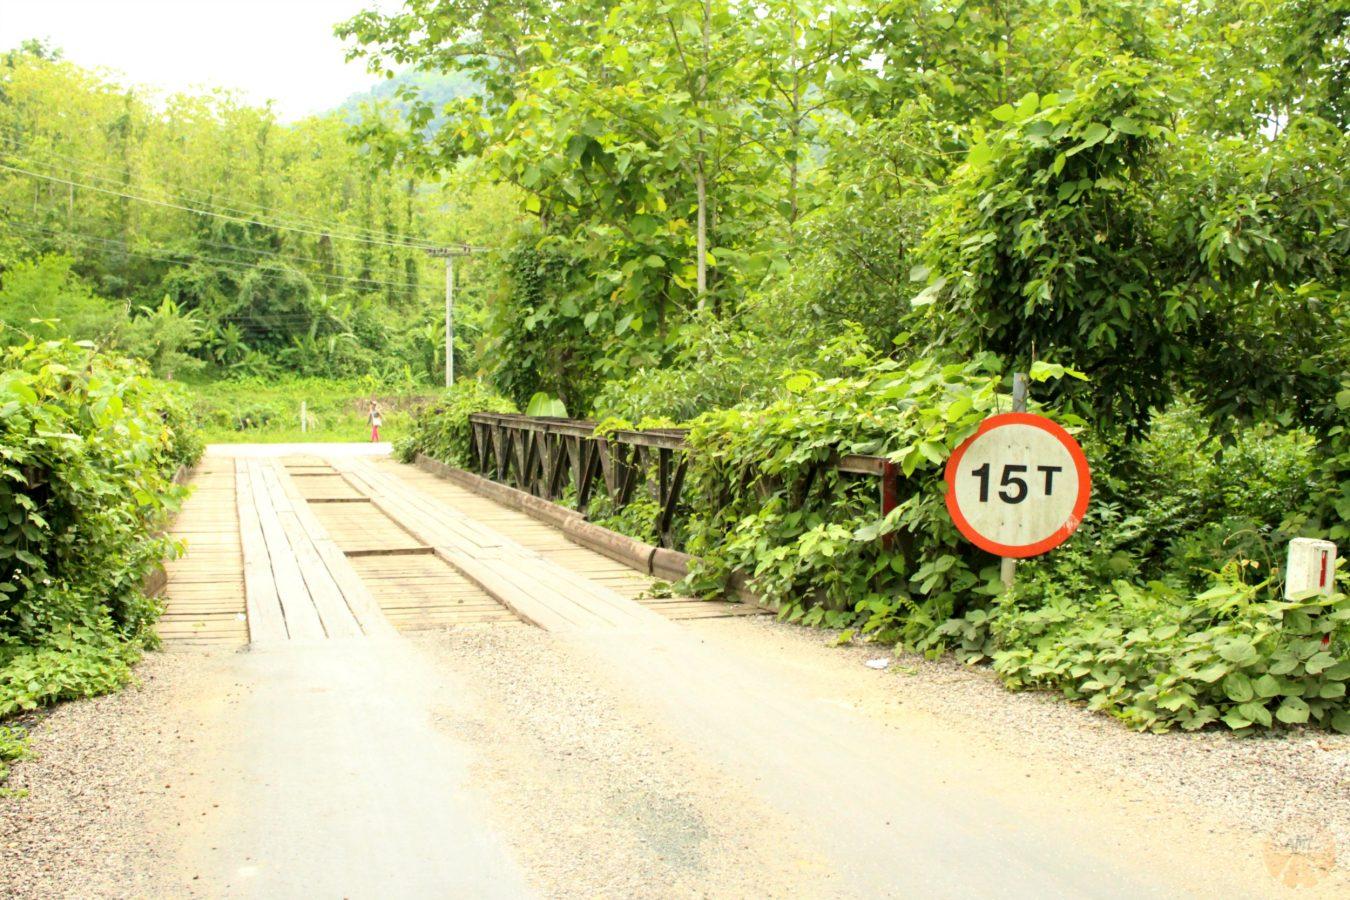 Bridges along the road